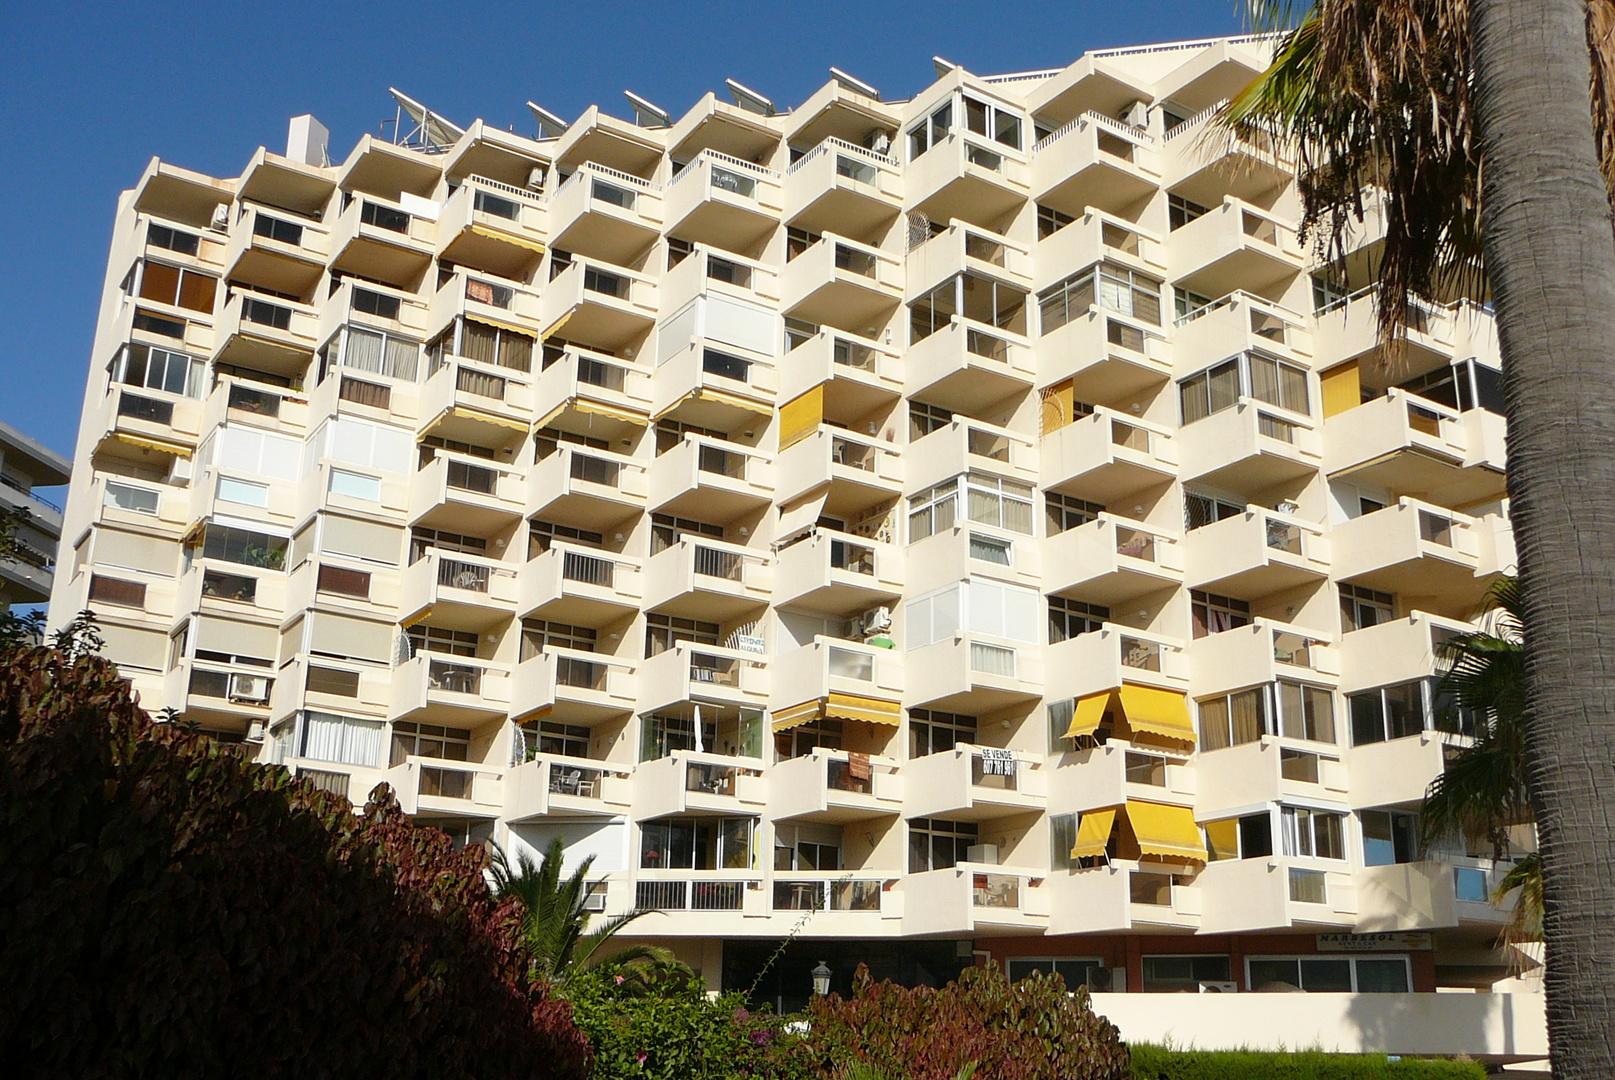 Marbella (8)